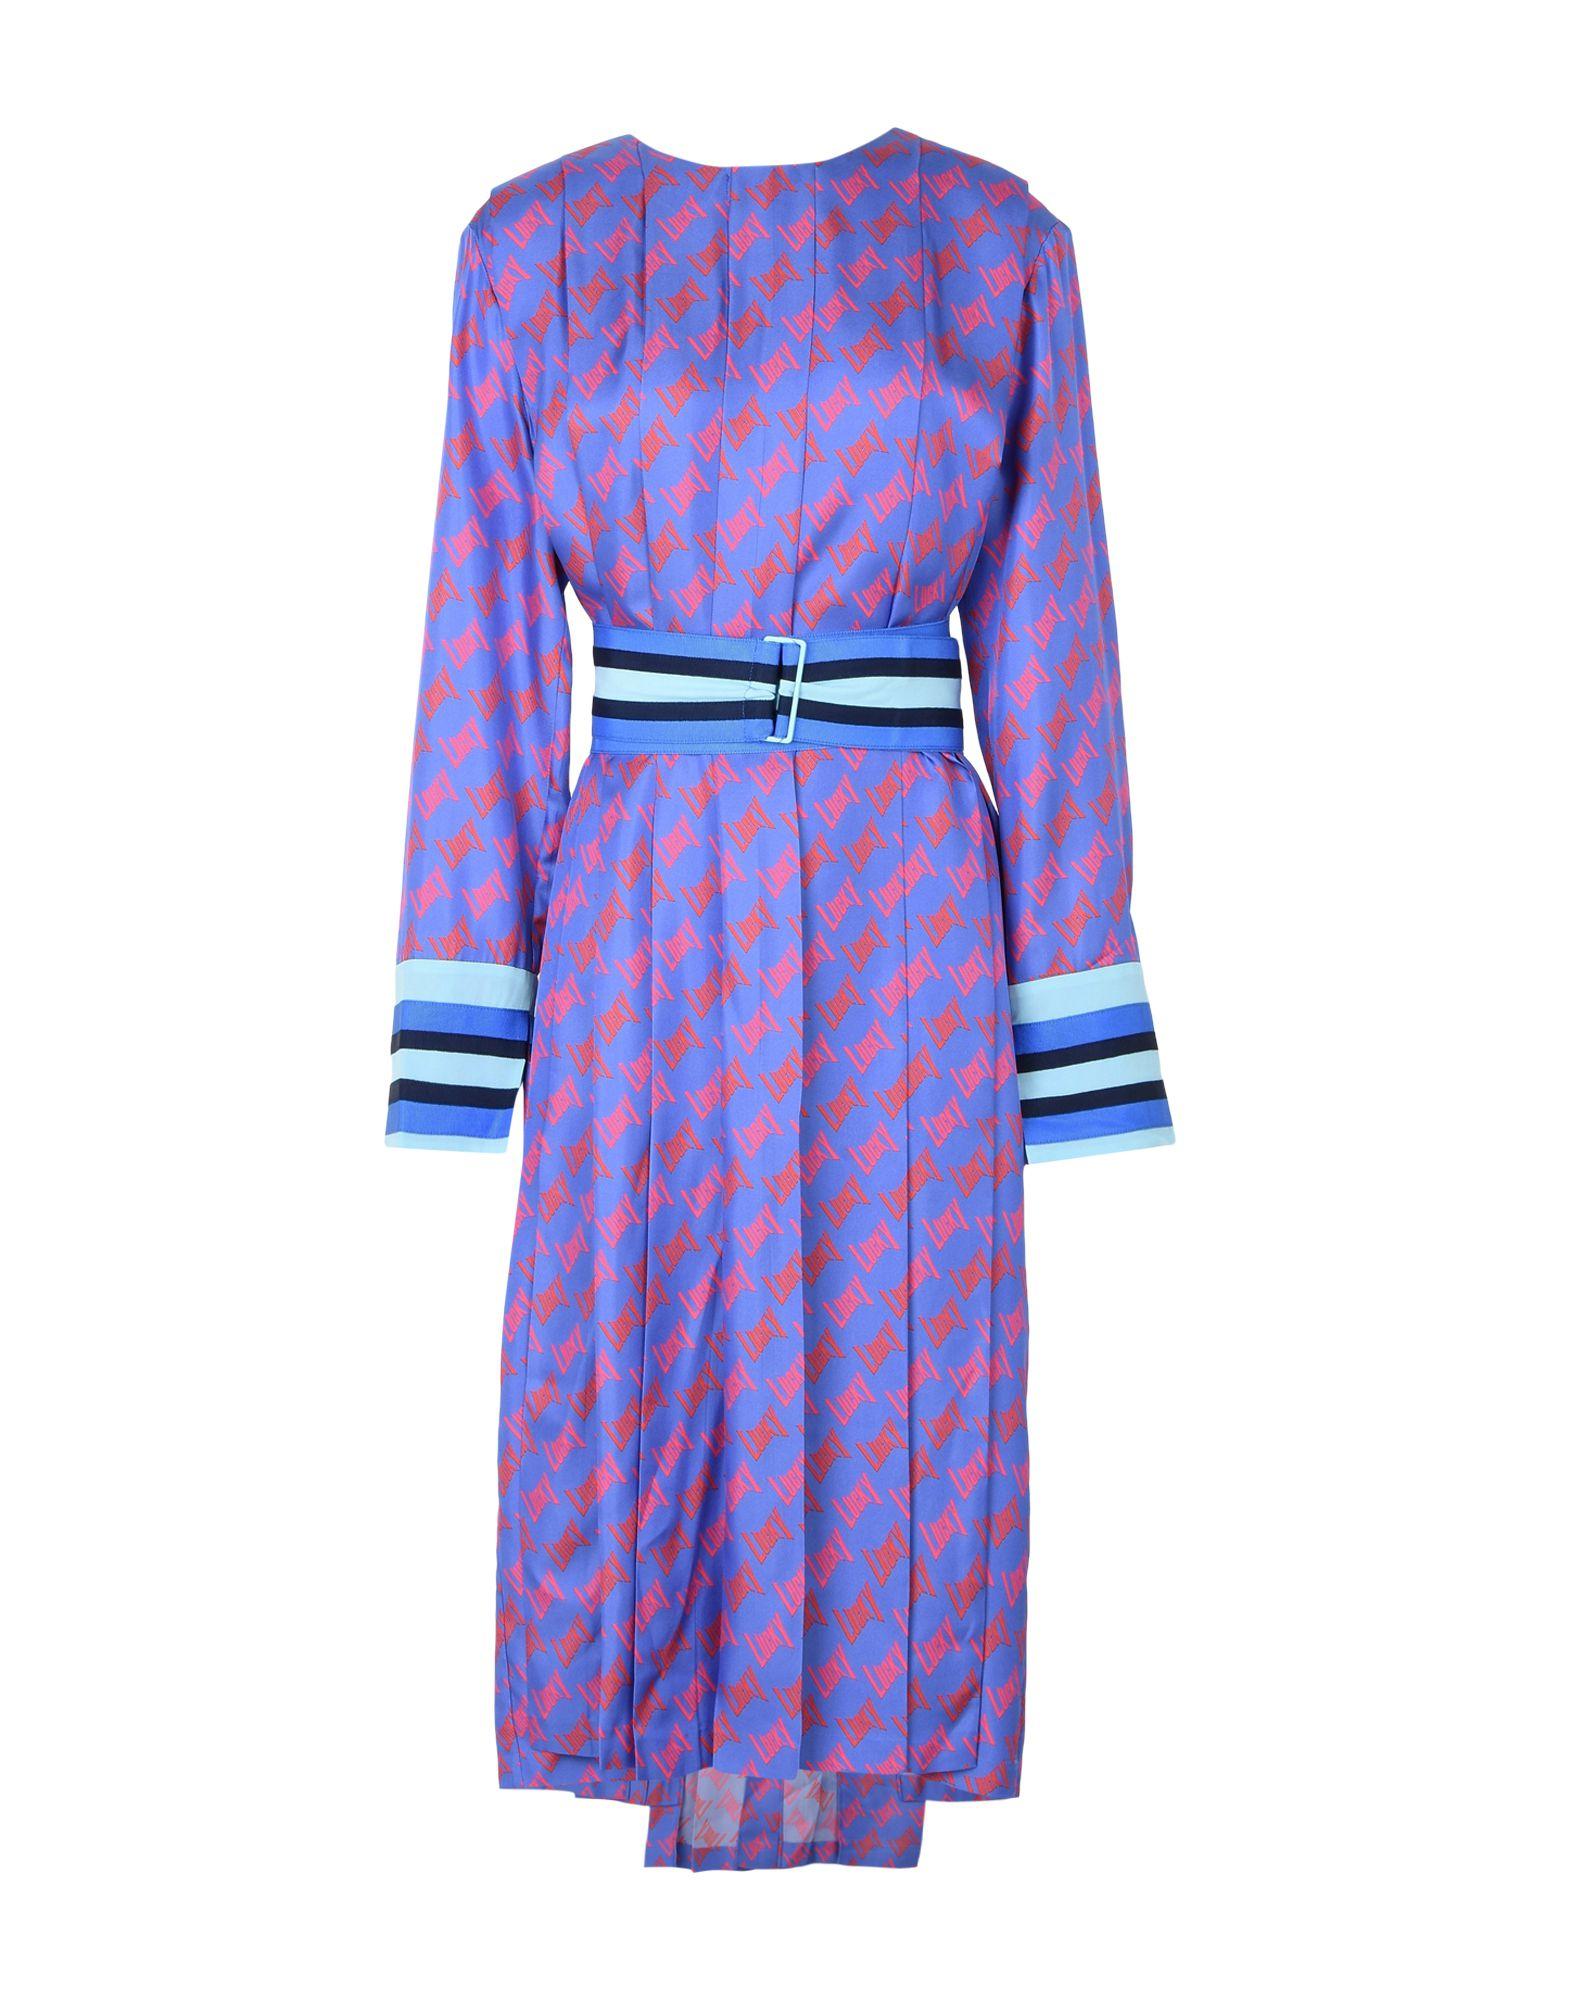 LUCKY CHOUETTE Платье длиной 3/4 lisa corti платье длиной 3 4